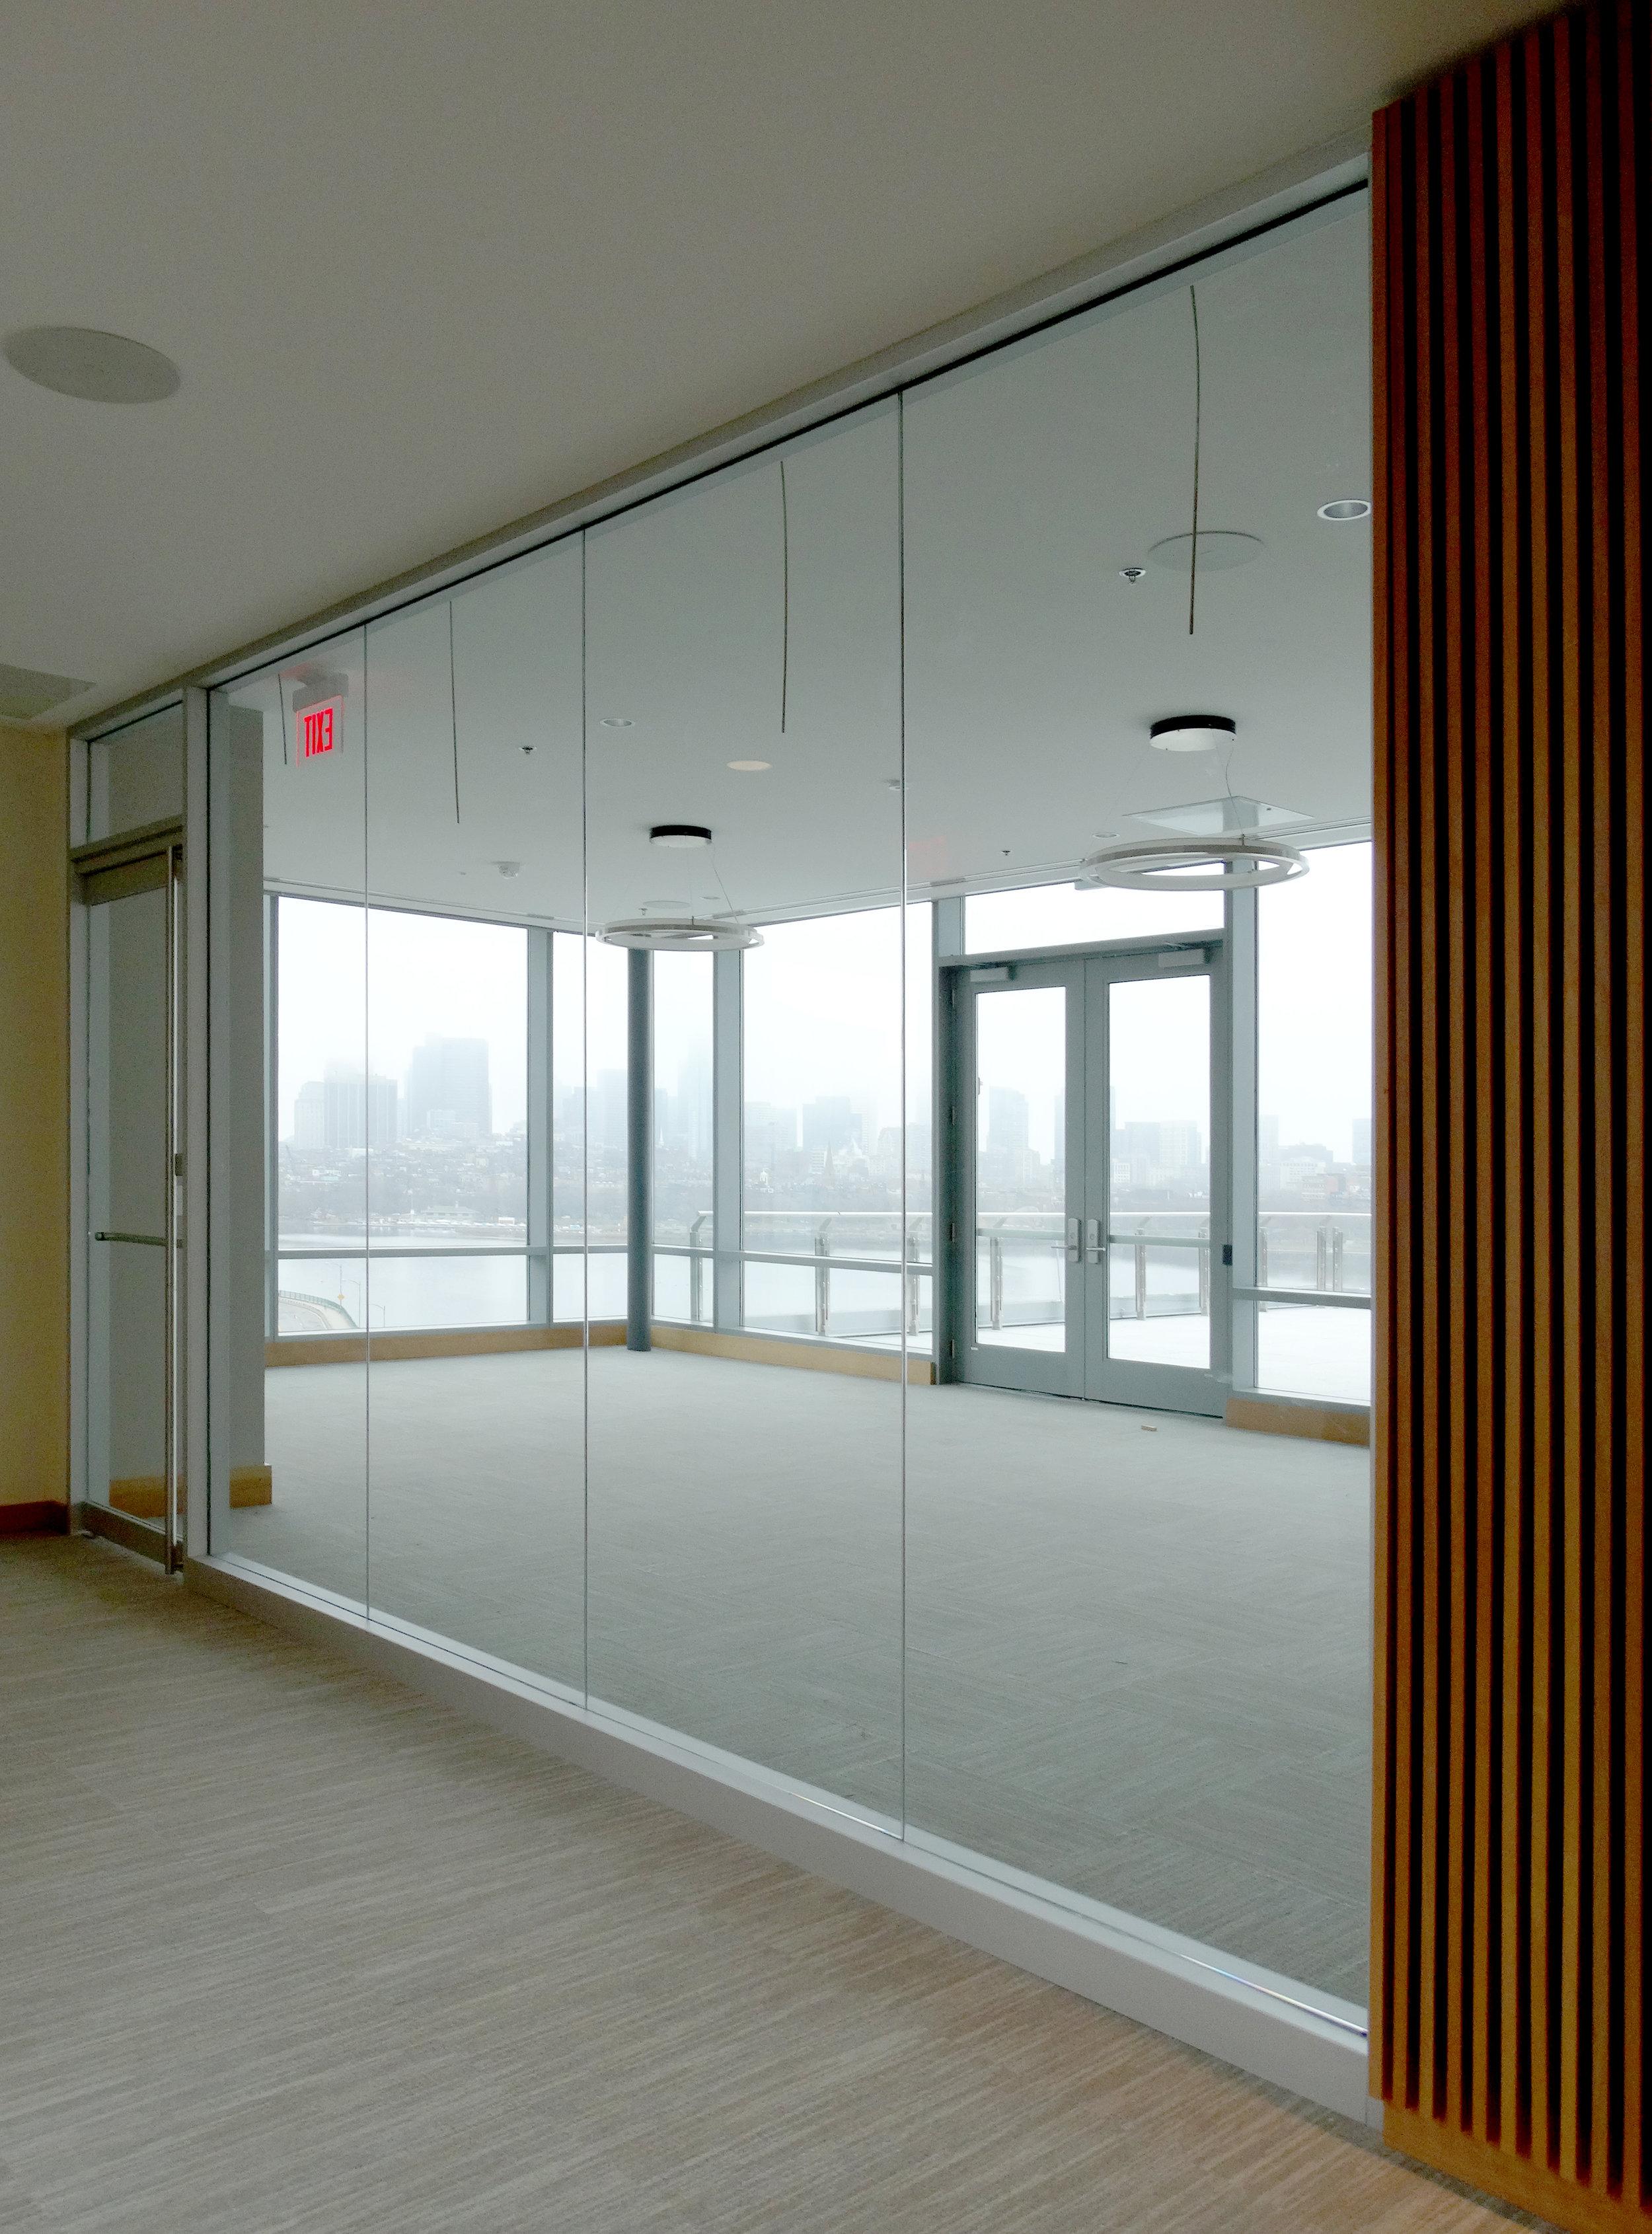 Encase Aluminum Framed Conference Wall Rail Glass Door - Spaceworks AI.jpg